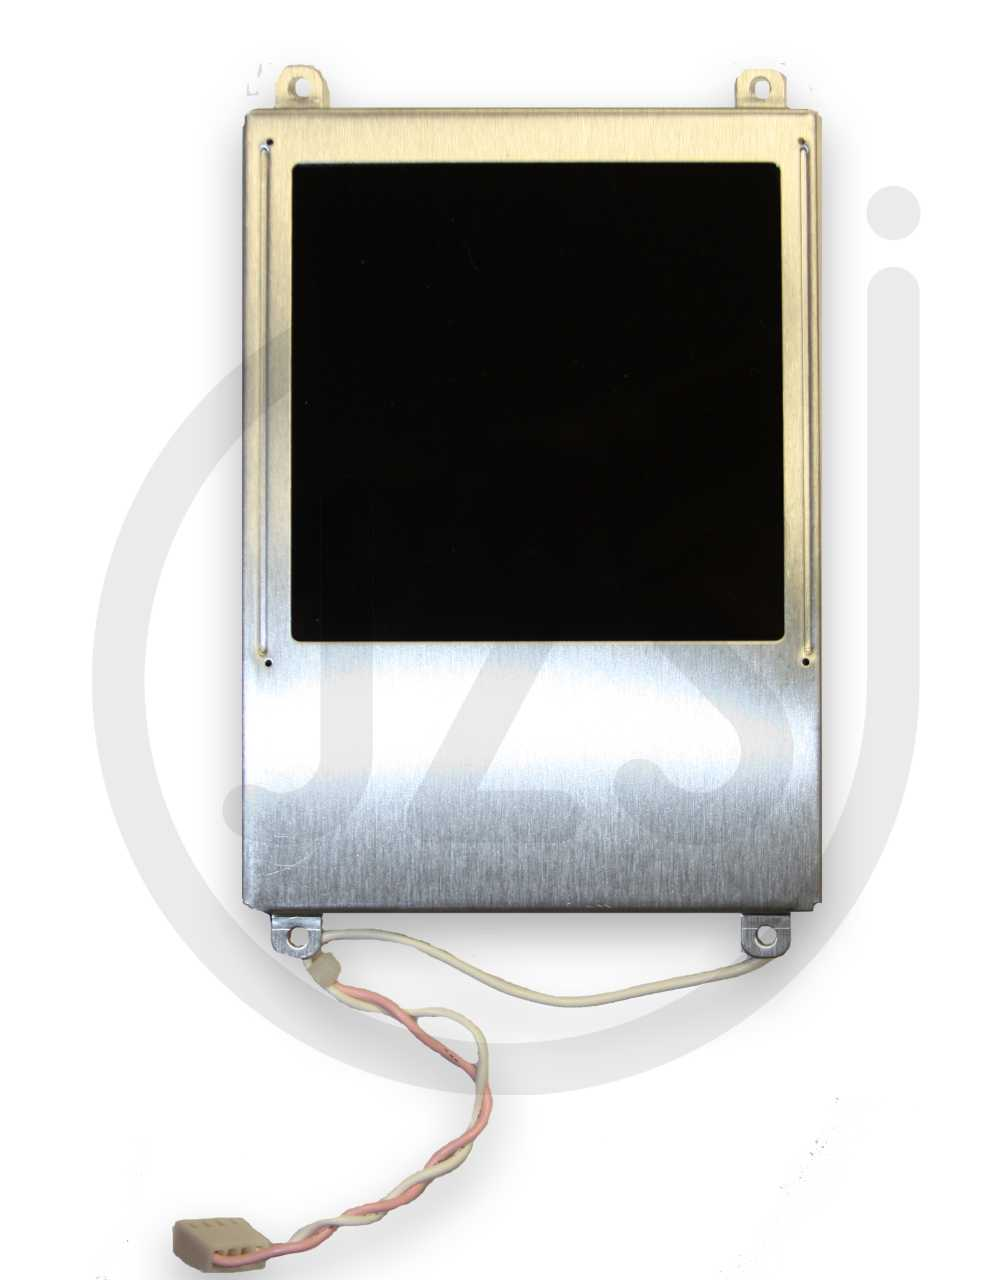 Plum A+ LCD Display Image